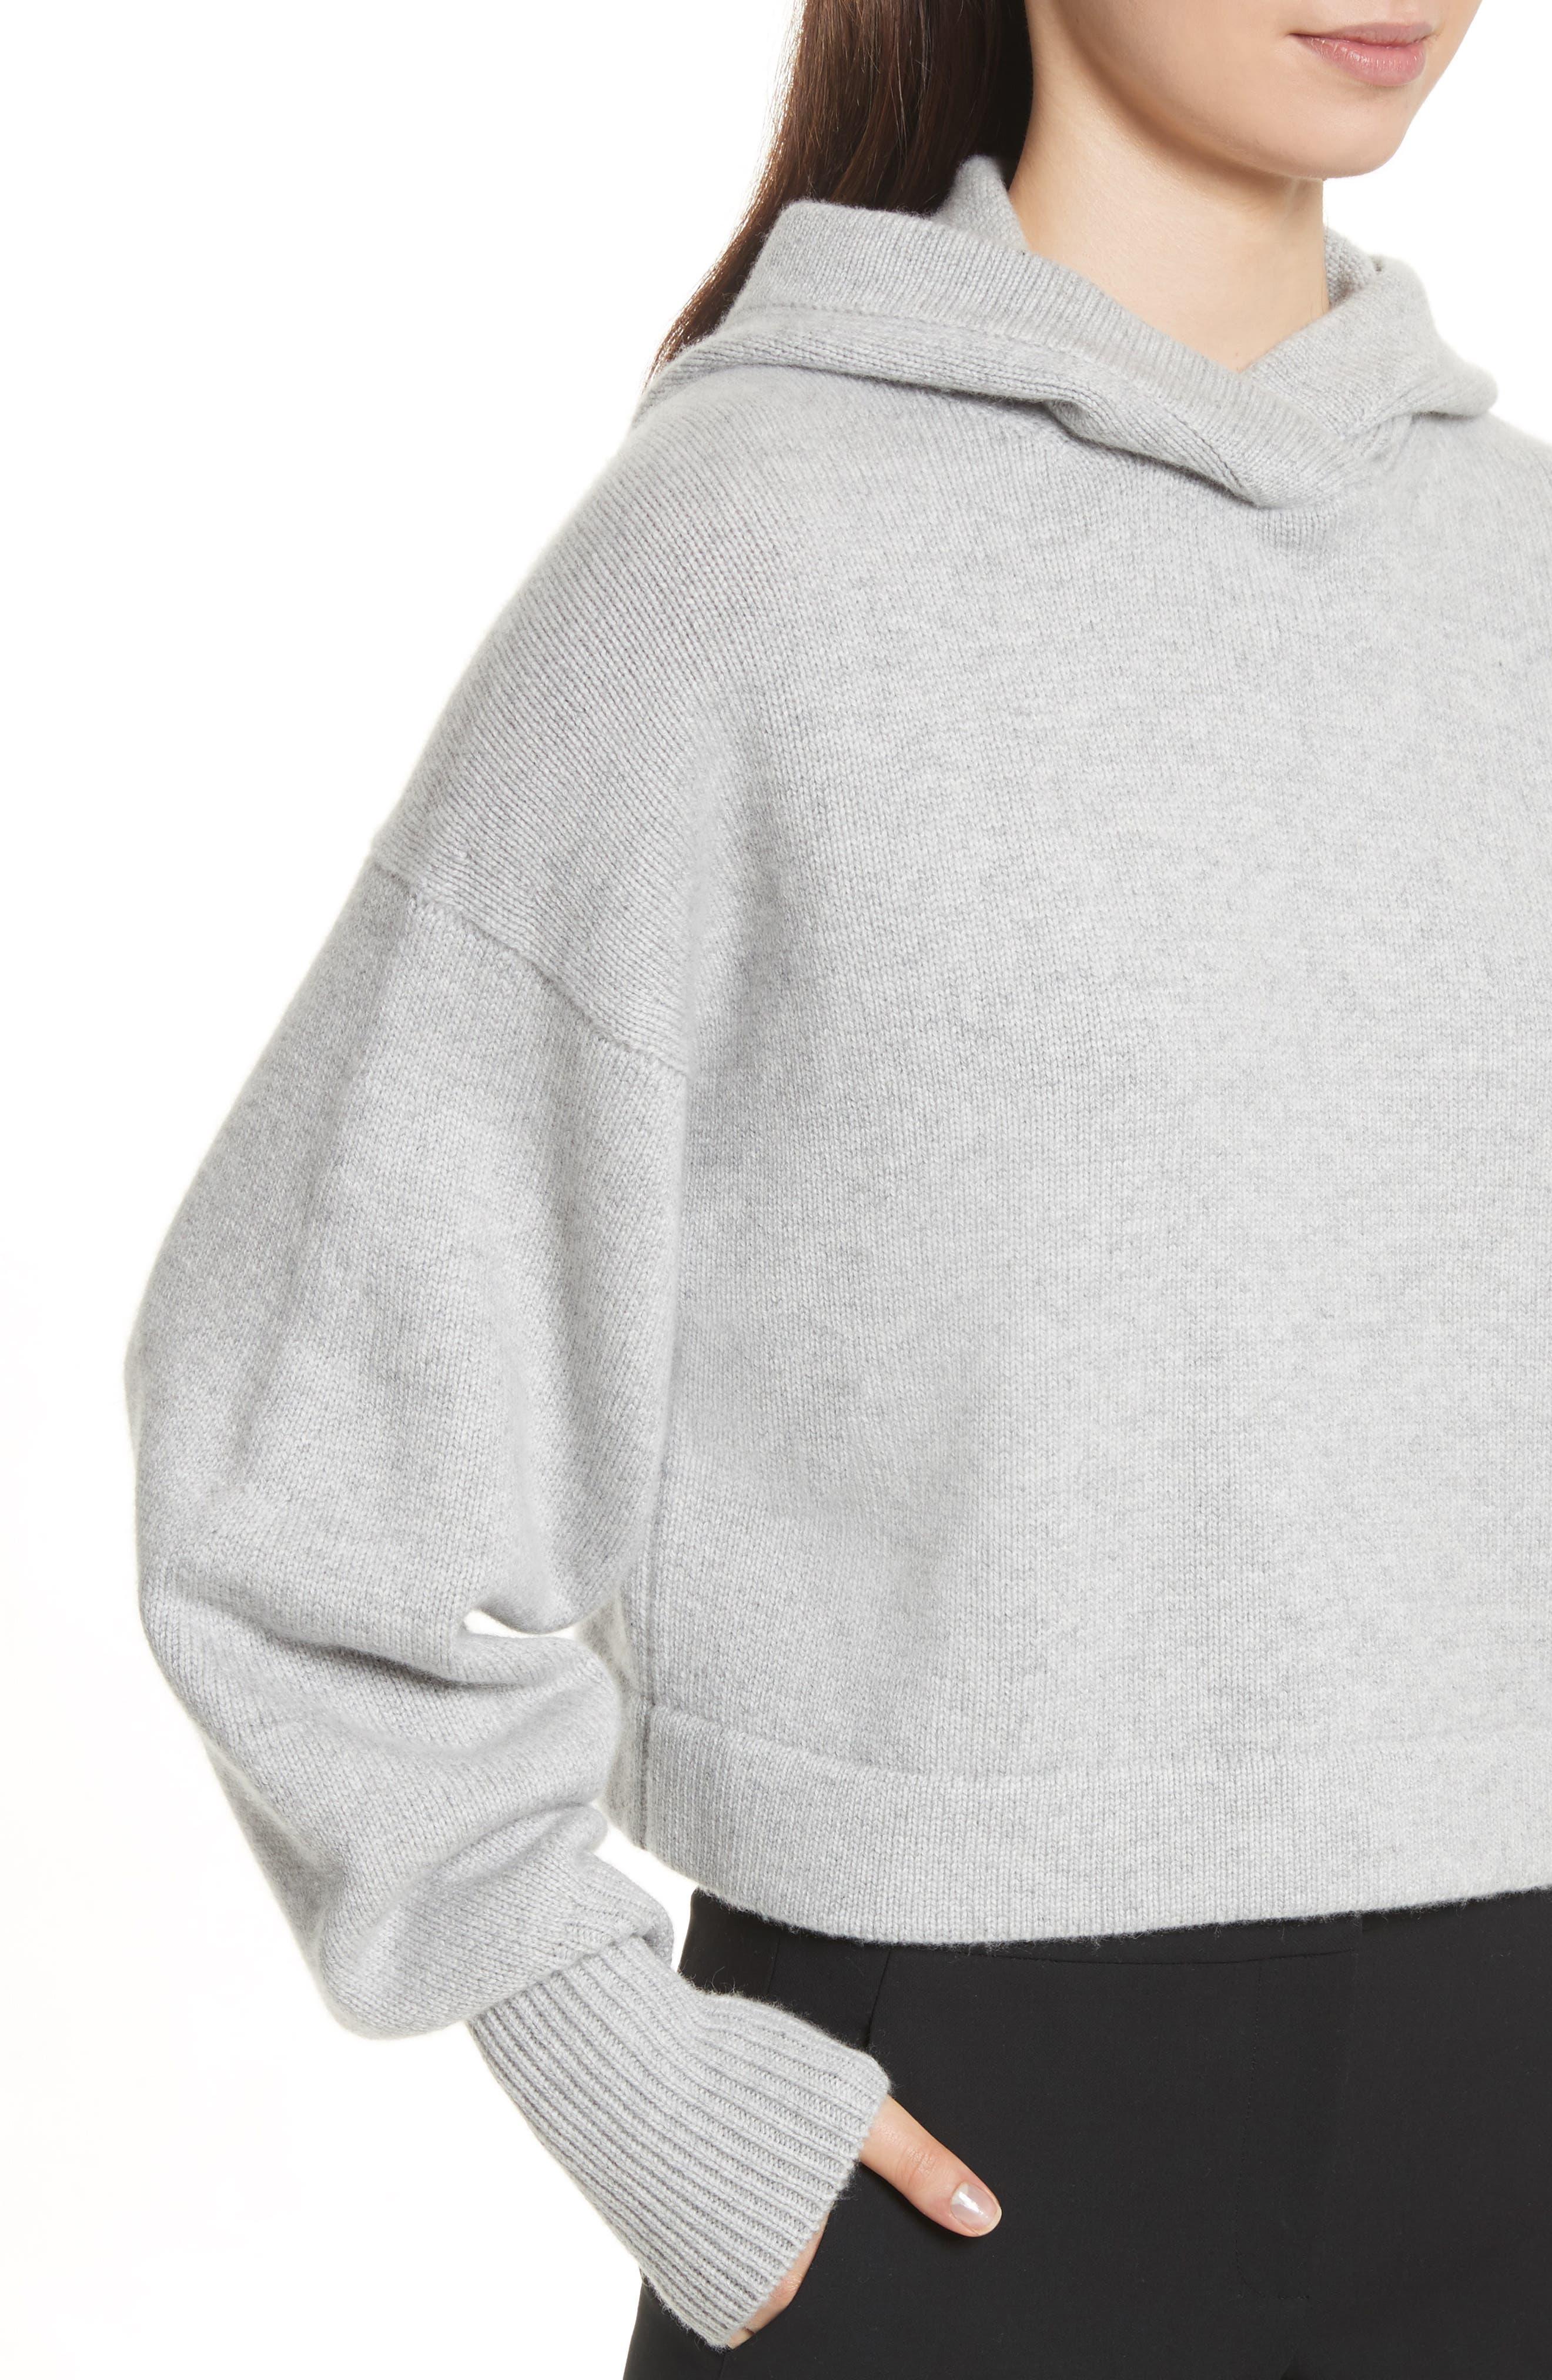 Blouson Sleeve Cashmere Hoodie,                             Alternate thumbnail 5, color,                             Heather Grey